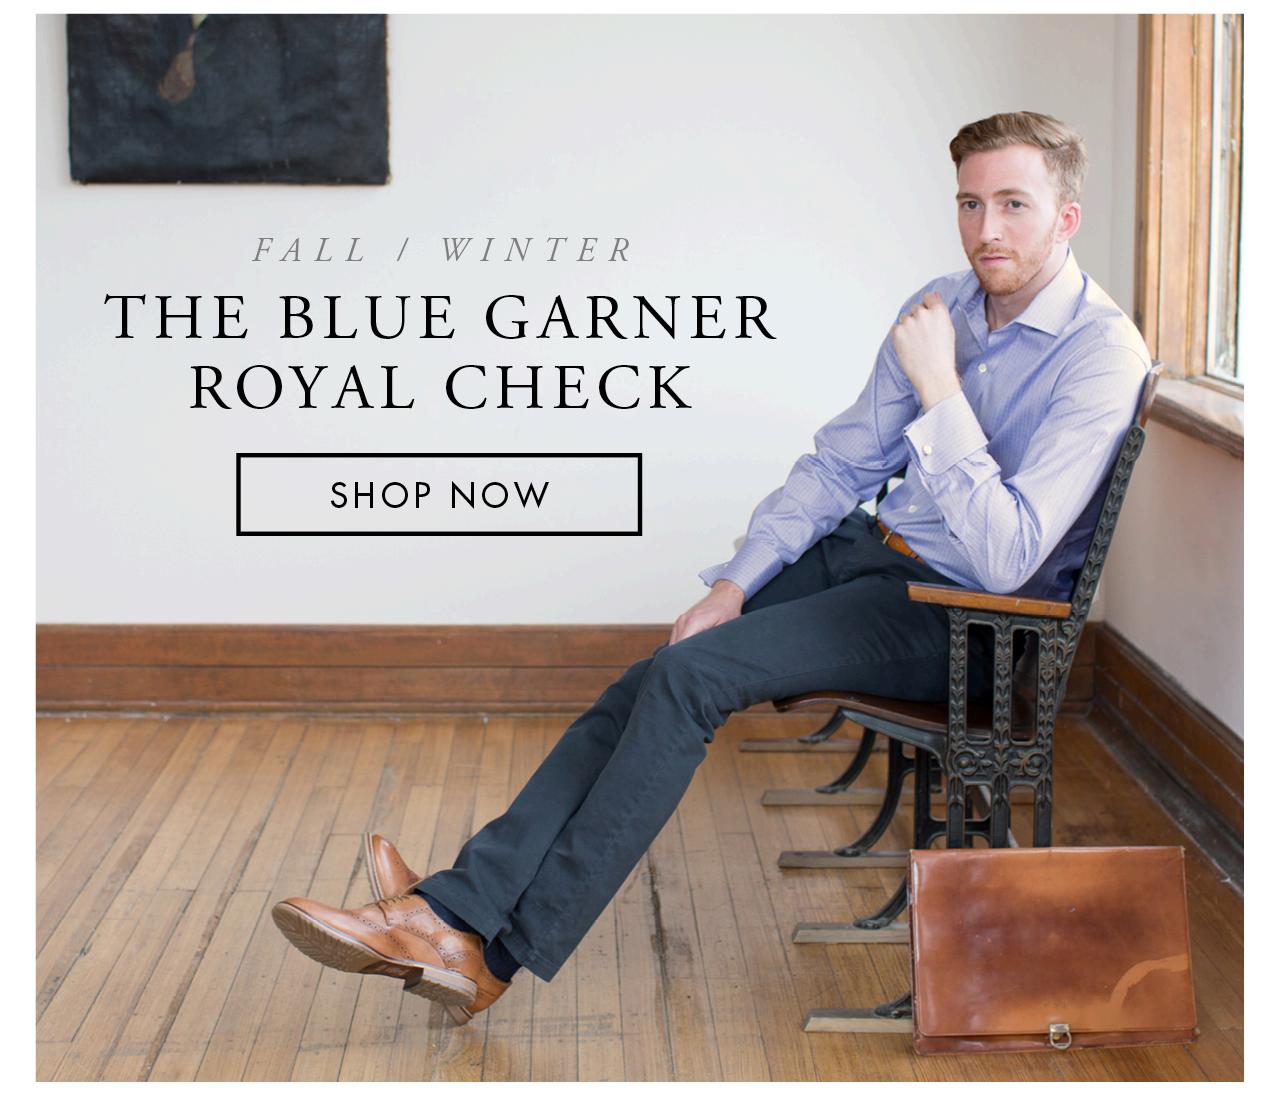 The Blue Garner Royal Check